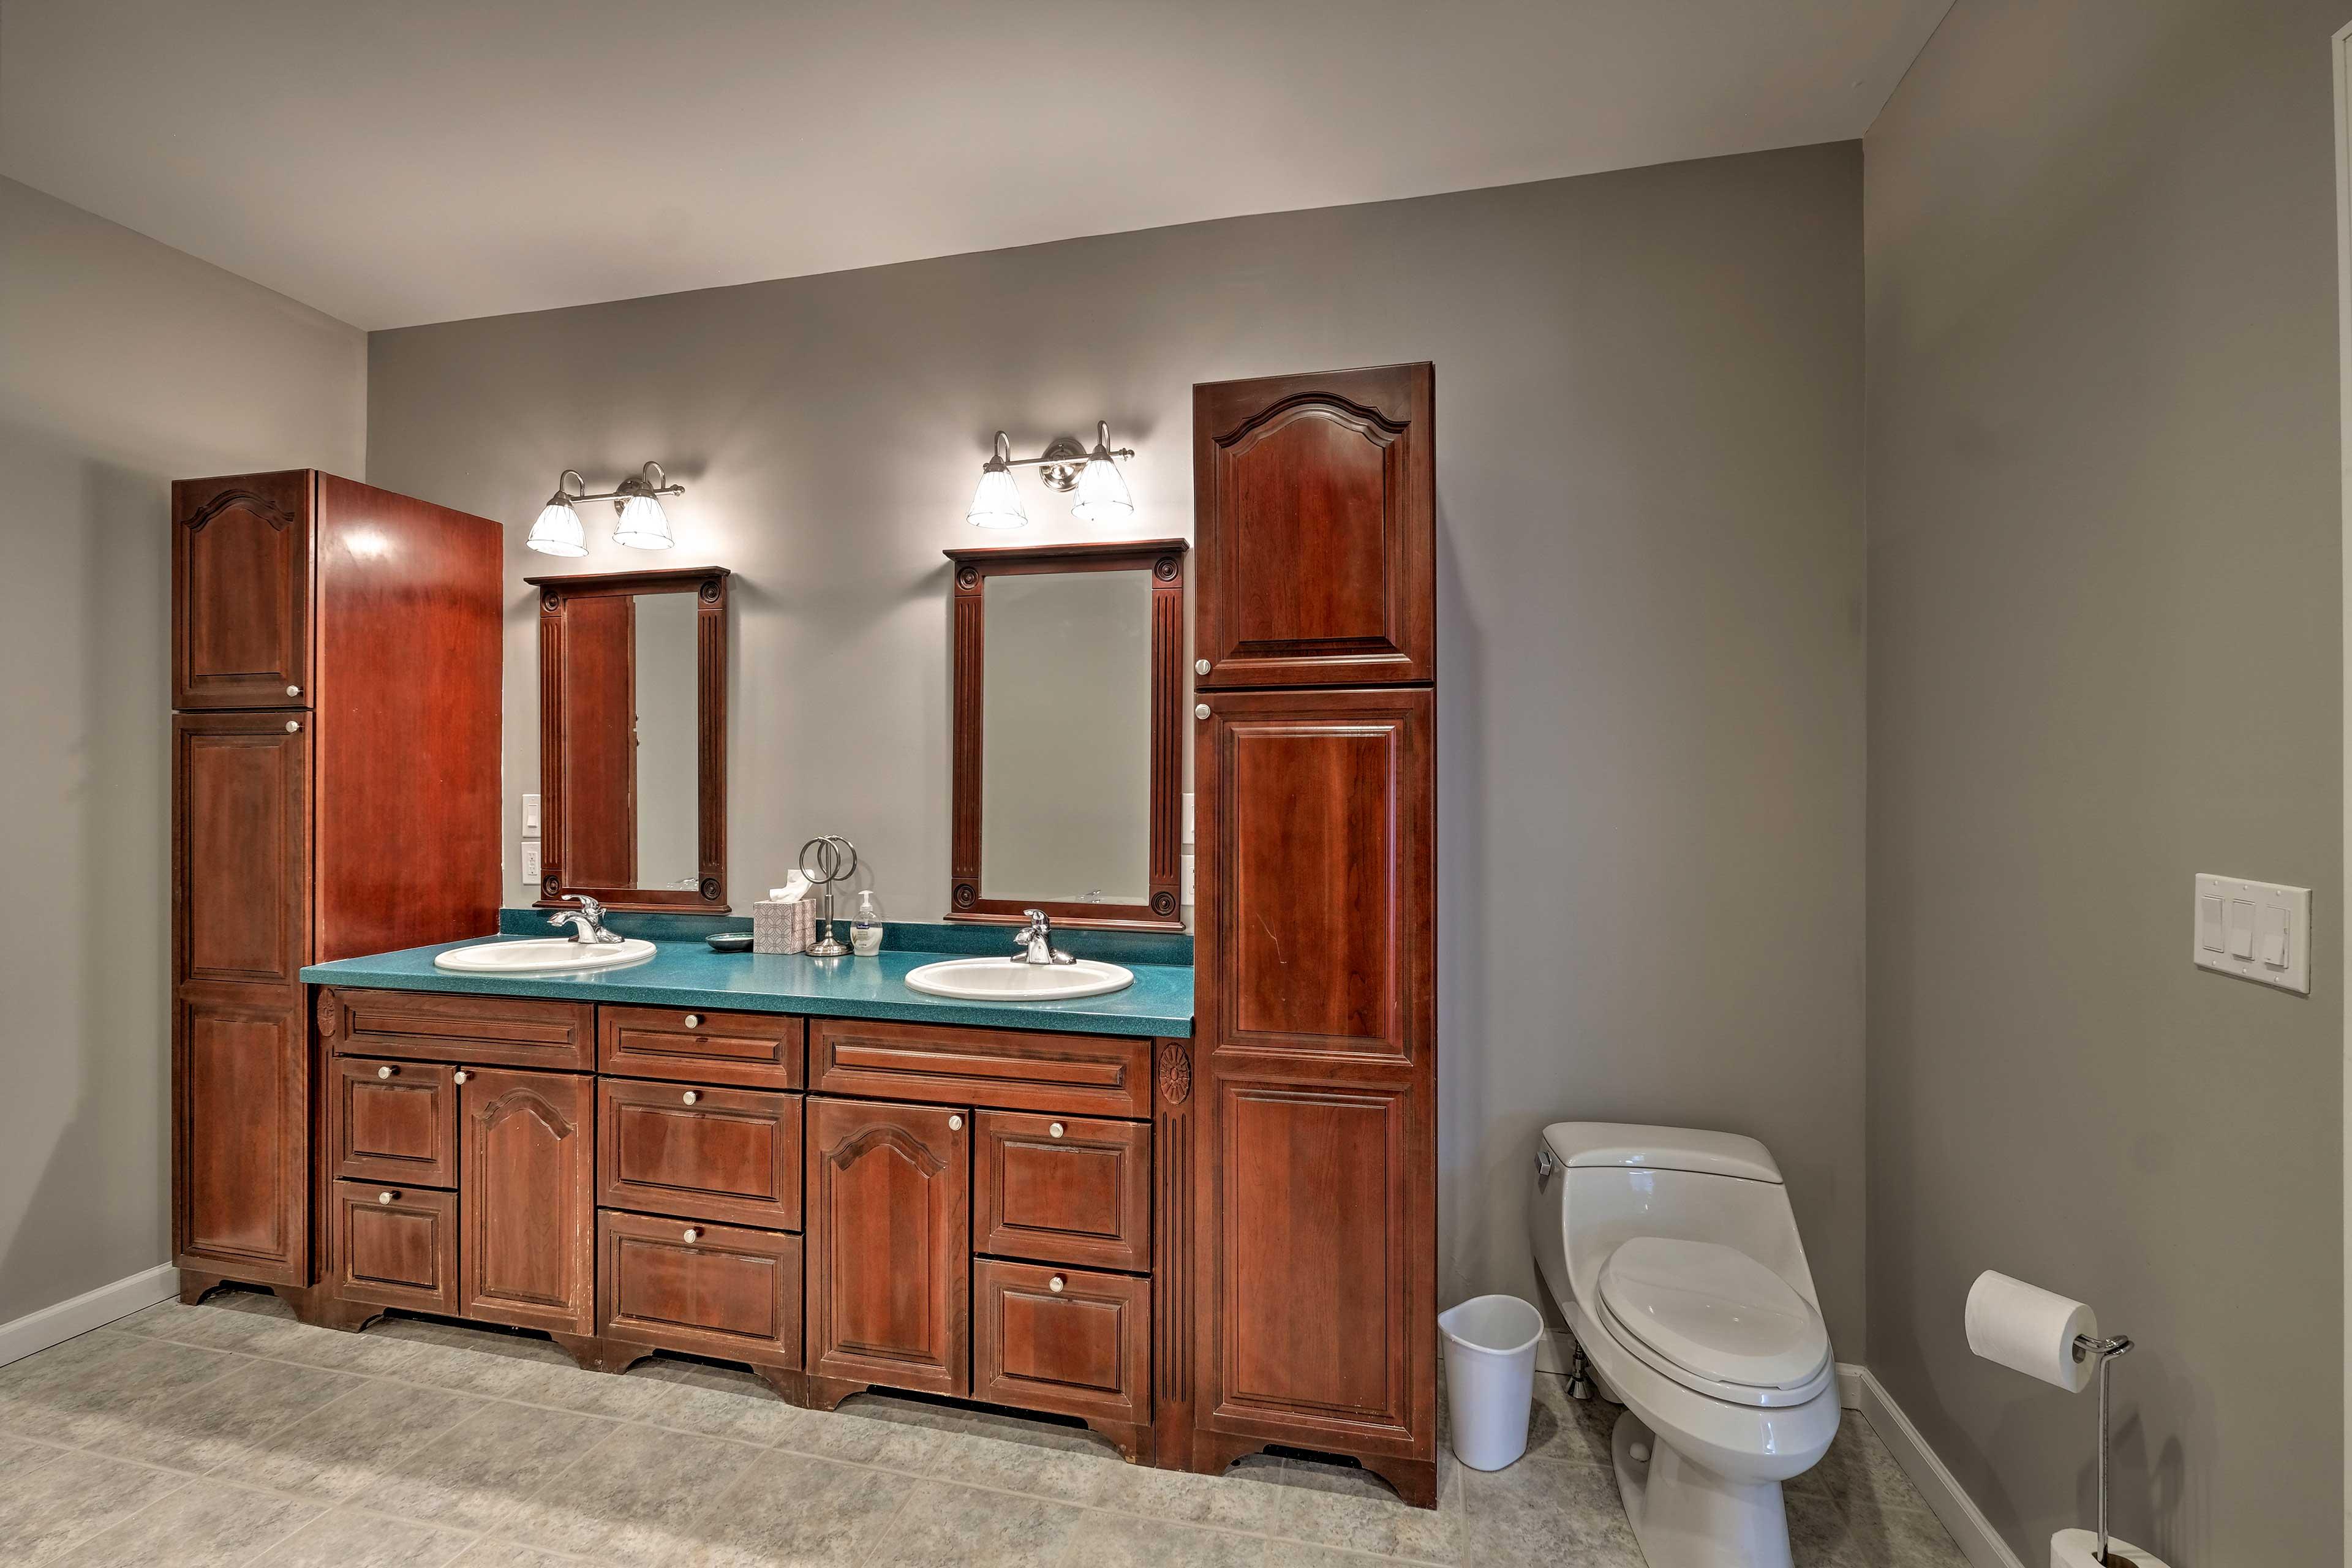 Bathroom 7: double vanity